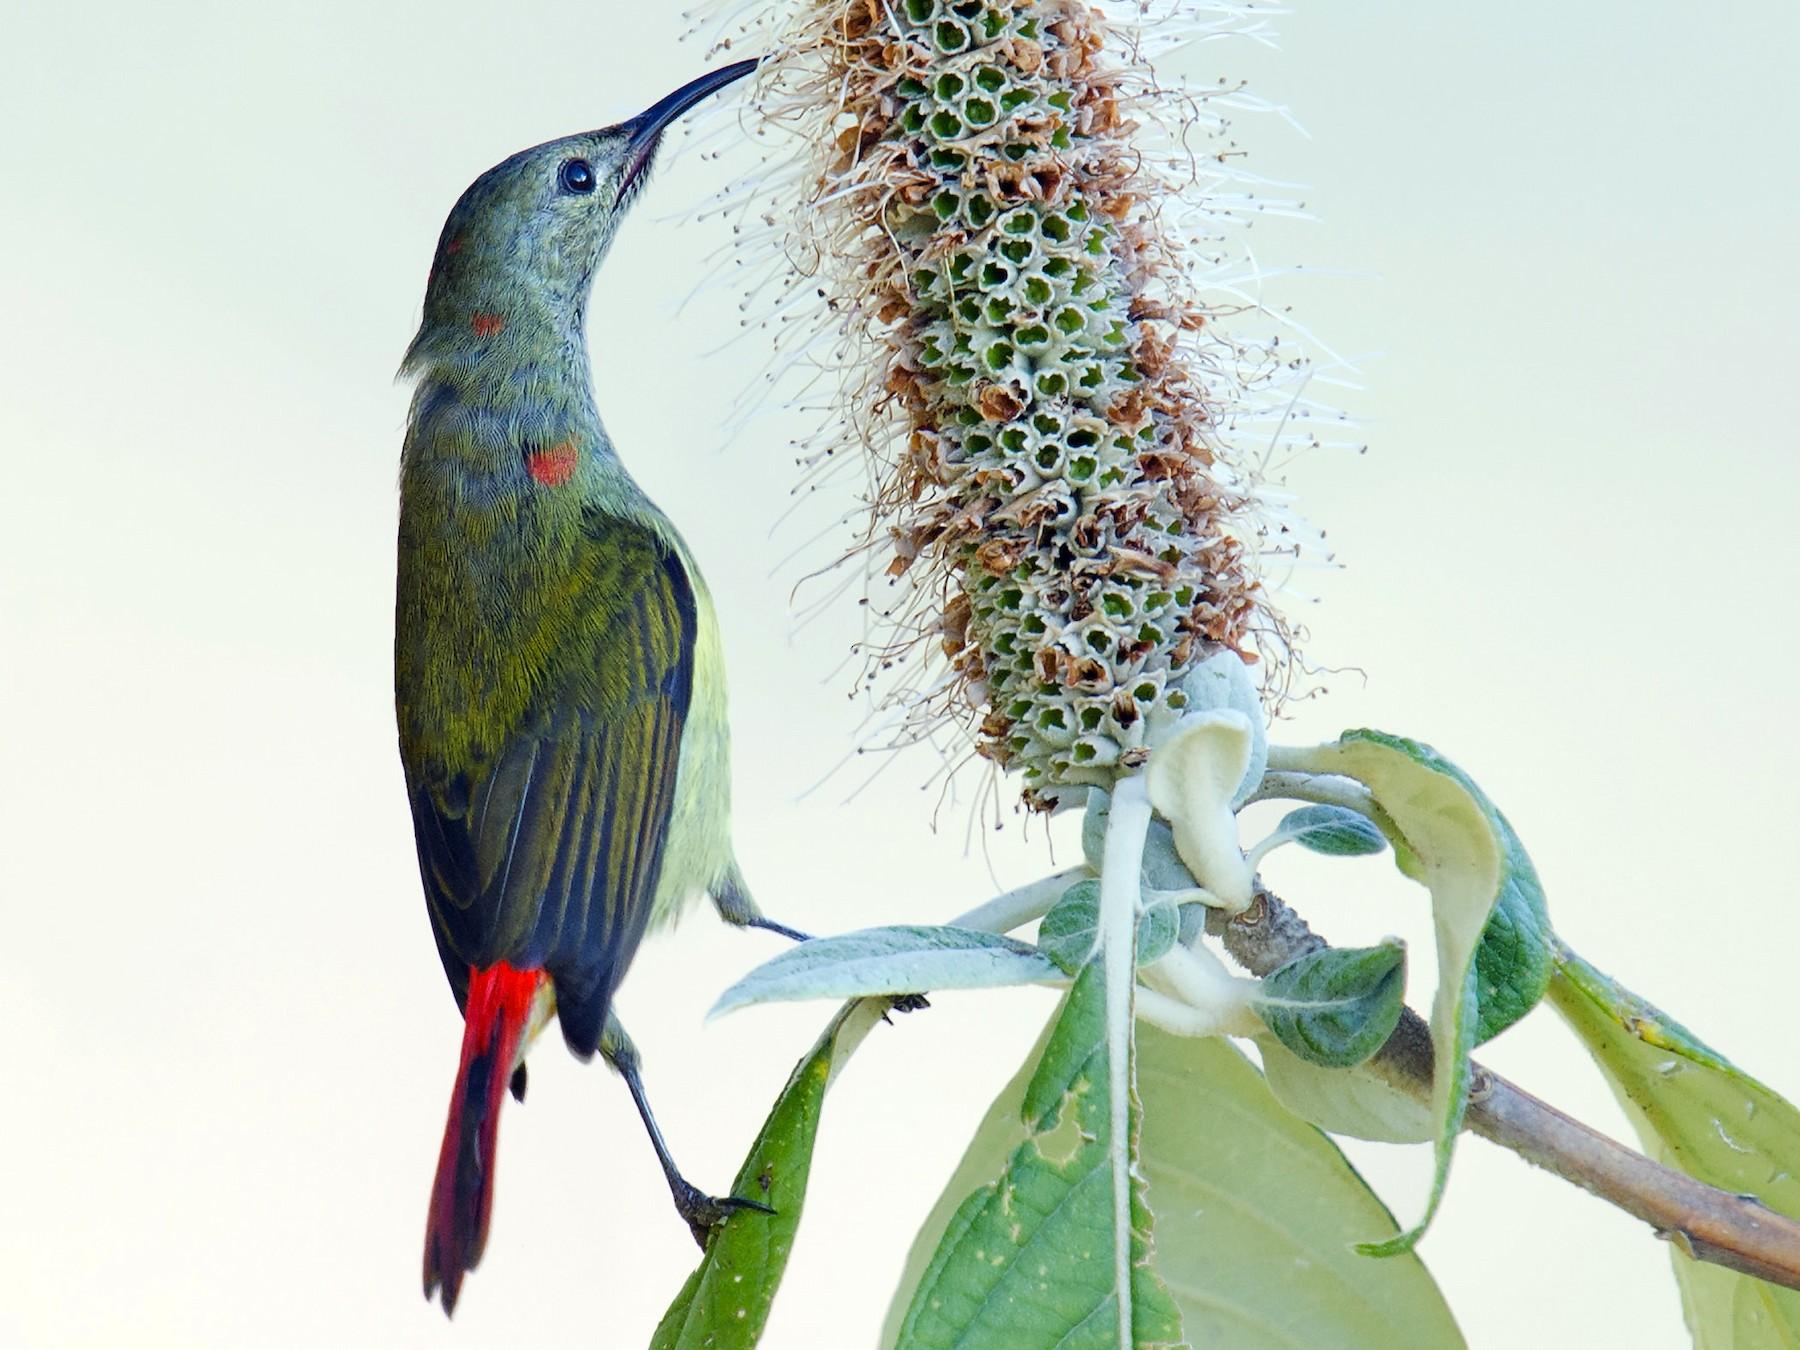 Fire-tailed Sunbird - Craig Brelsford